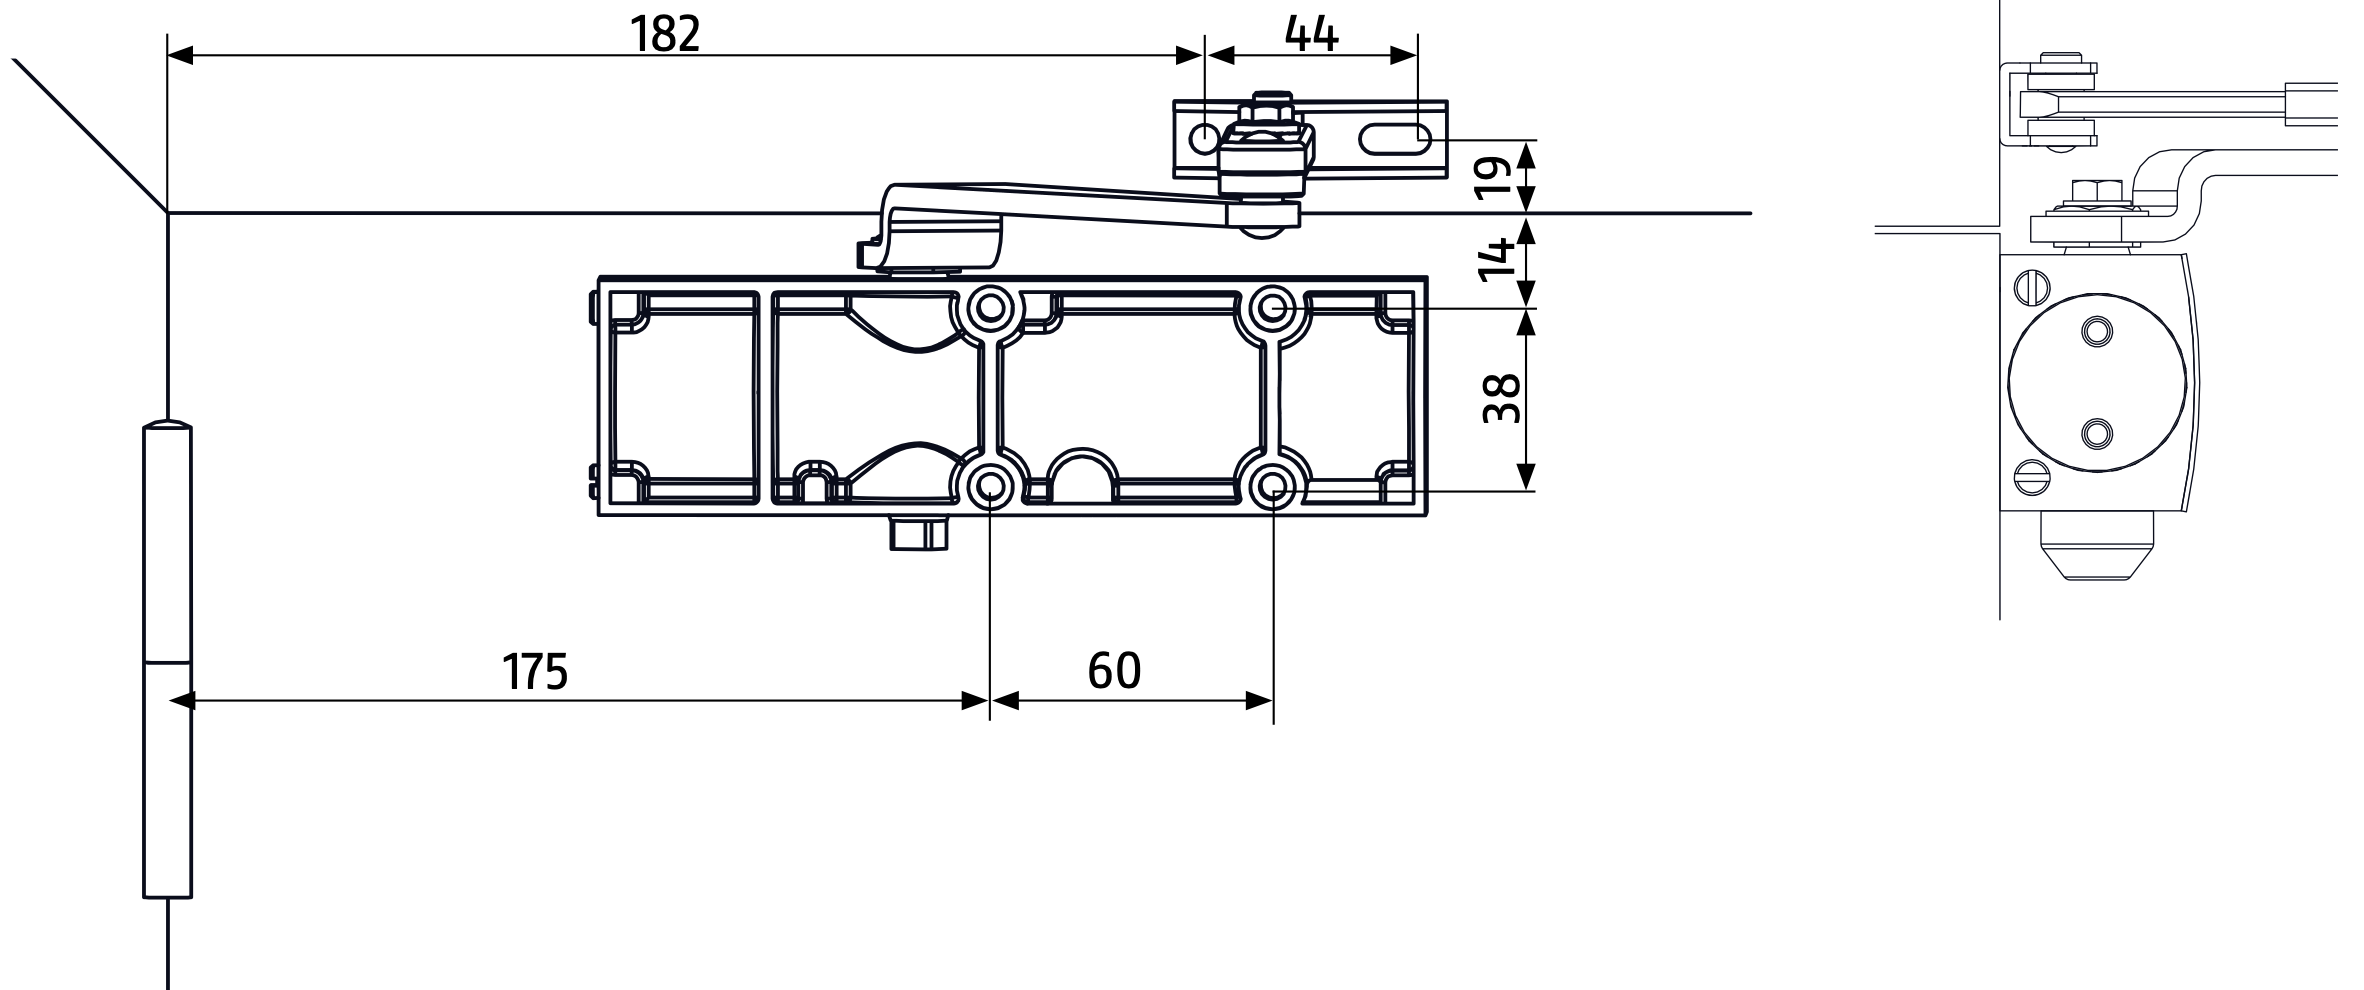 ABUS DC13023 AC7023